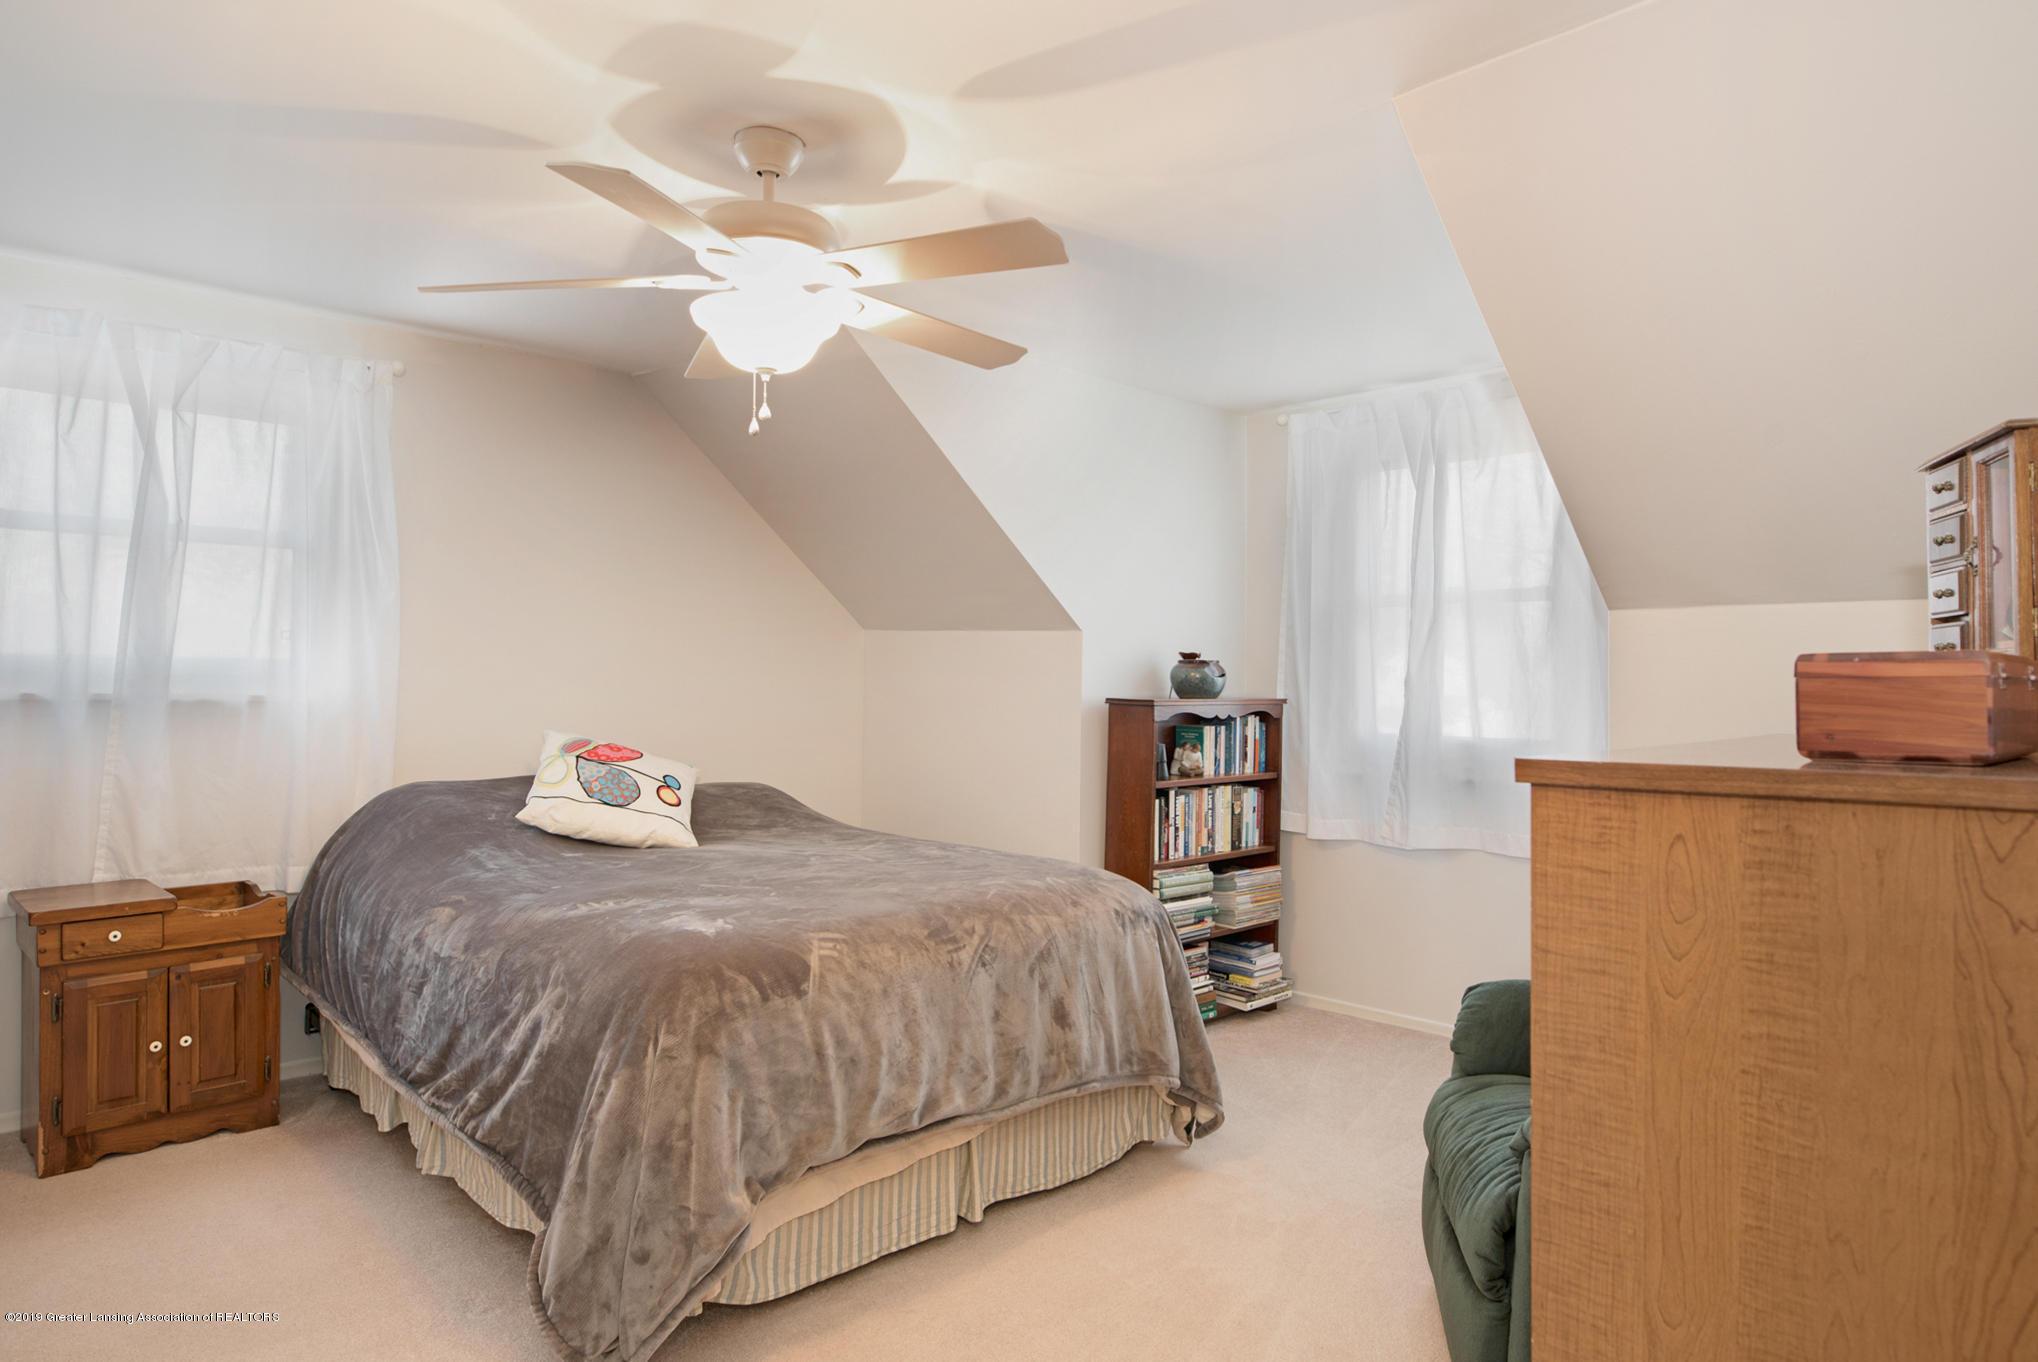 981 Ramblewood Dr - Bedroom 1 - 24